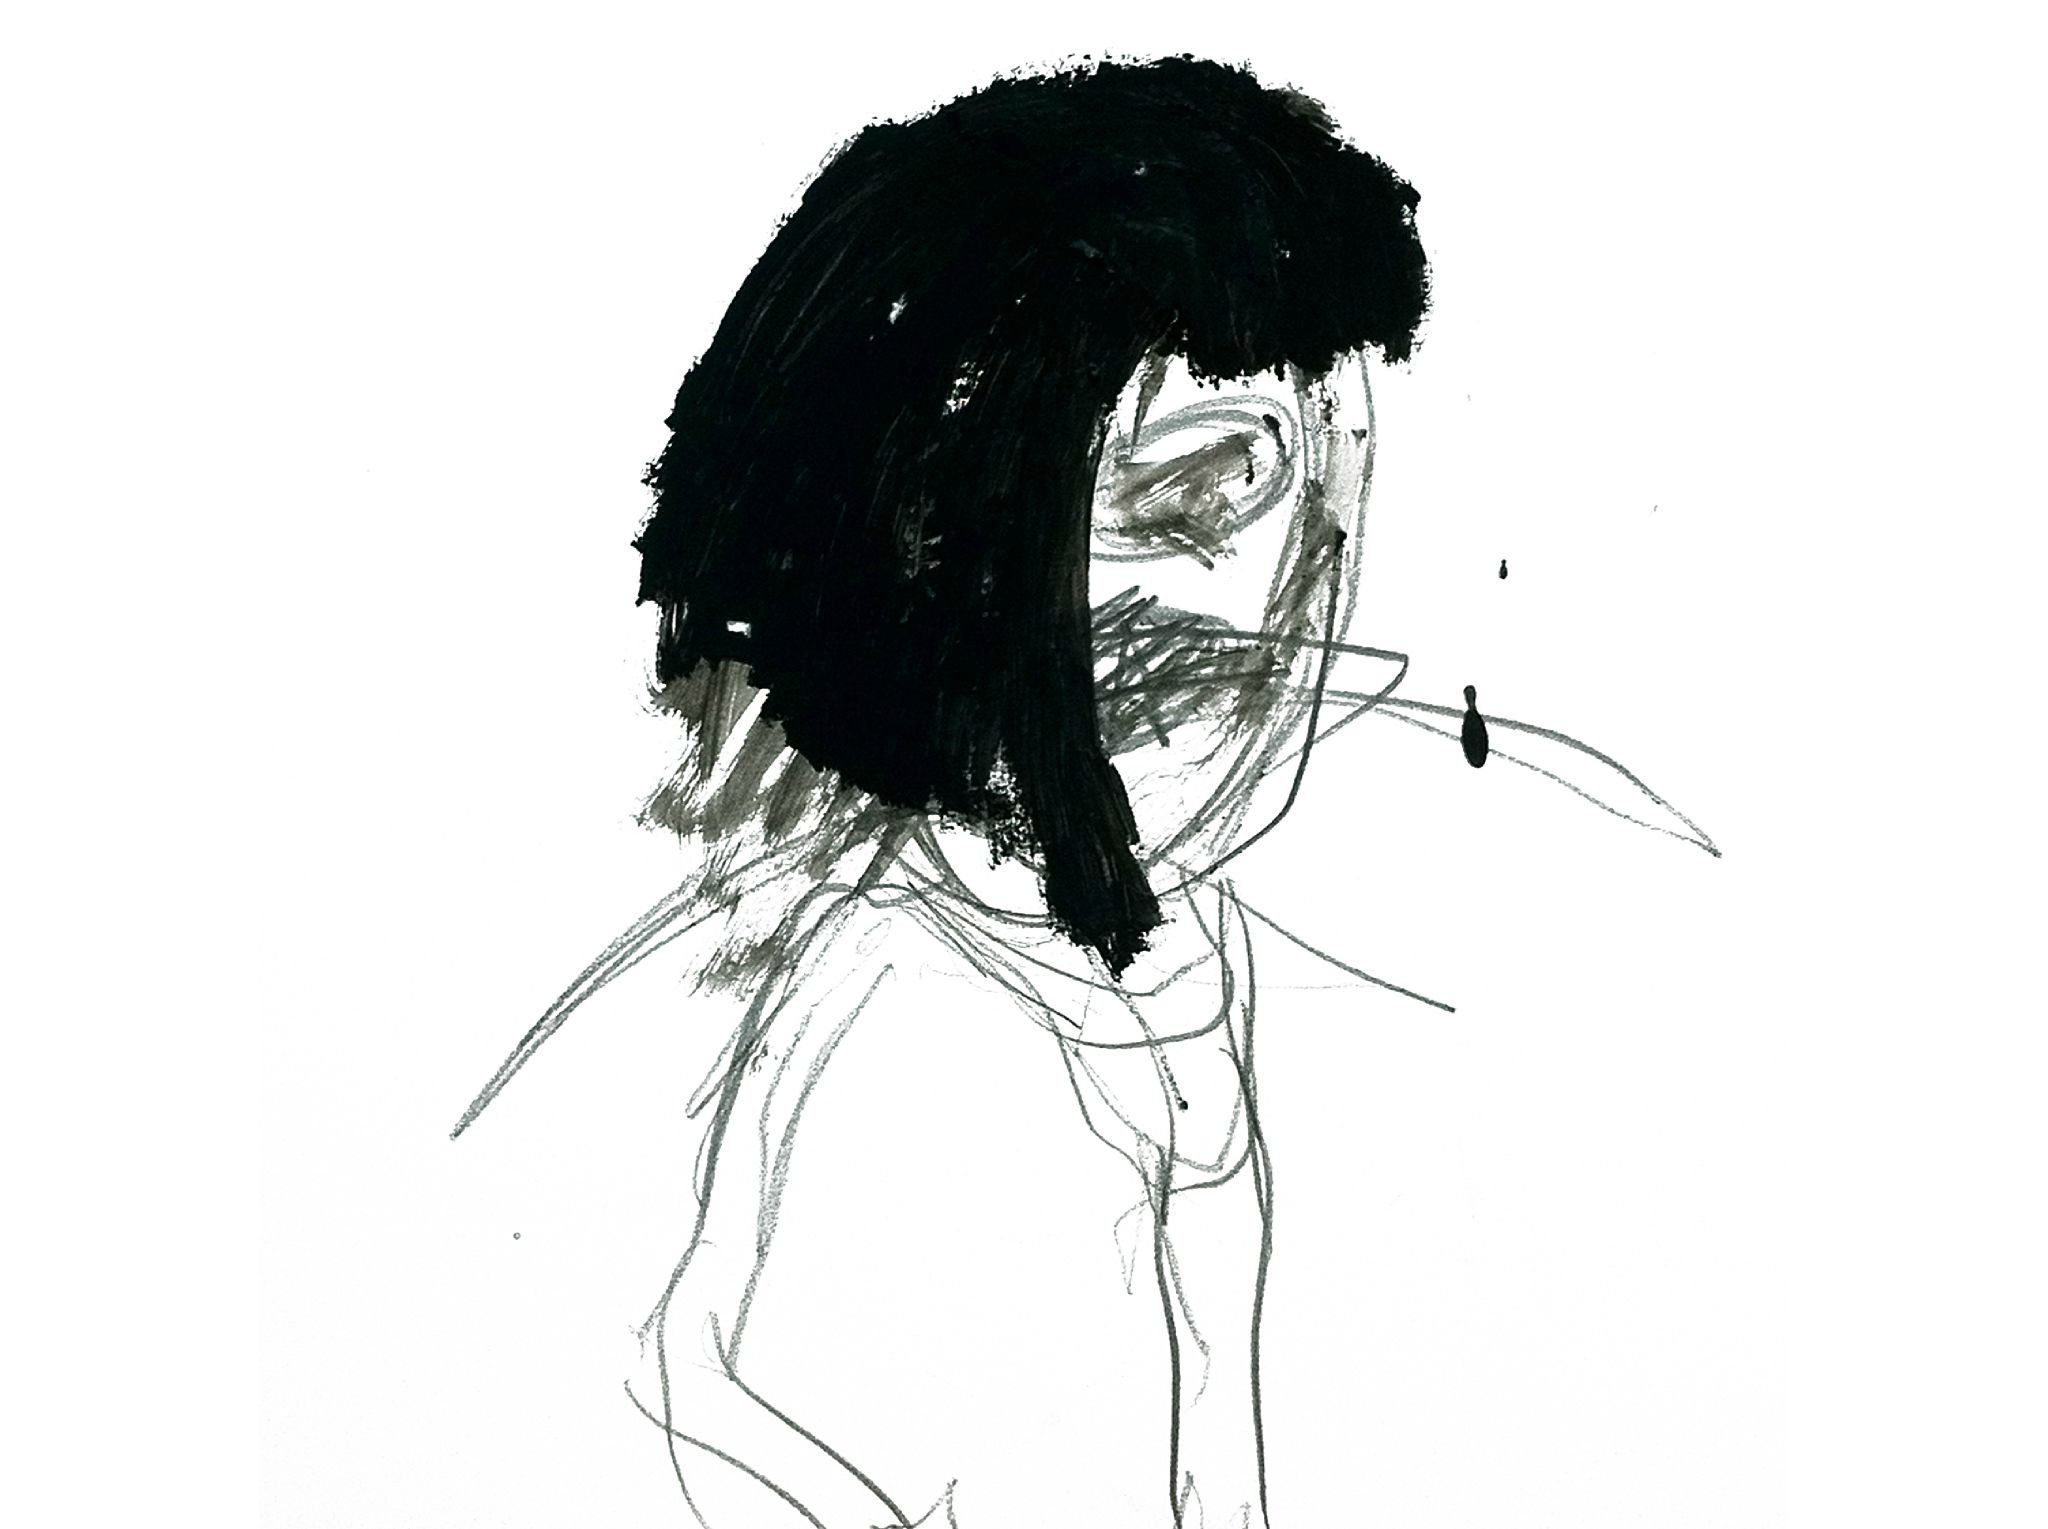 la salope, young perez